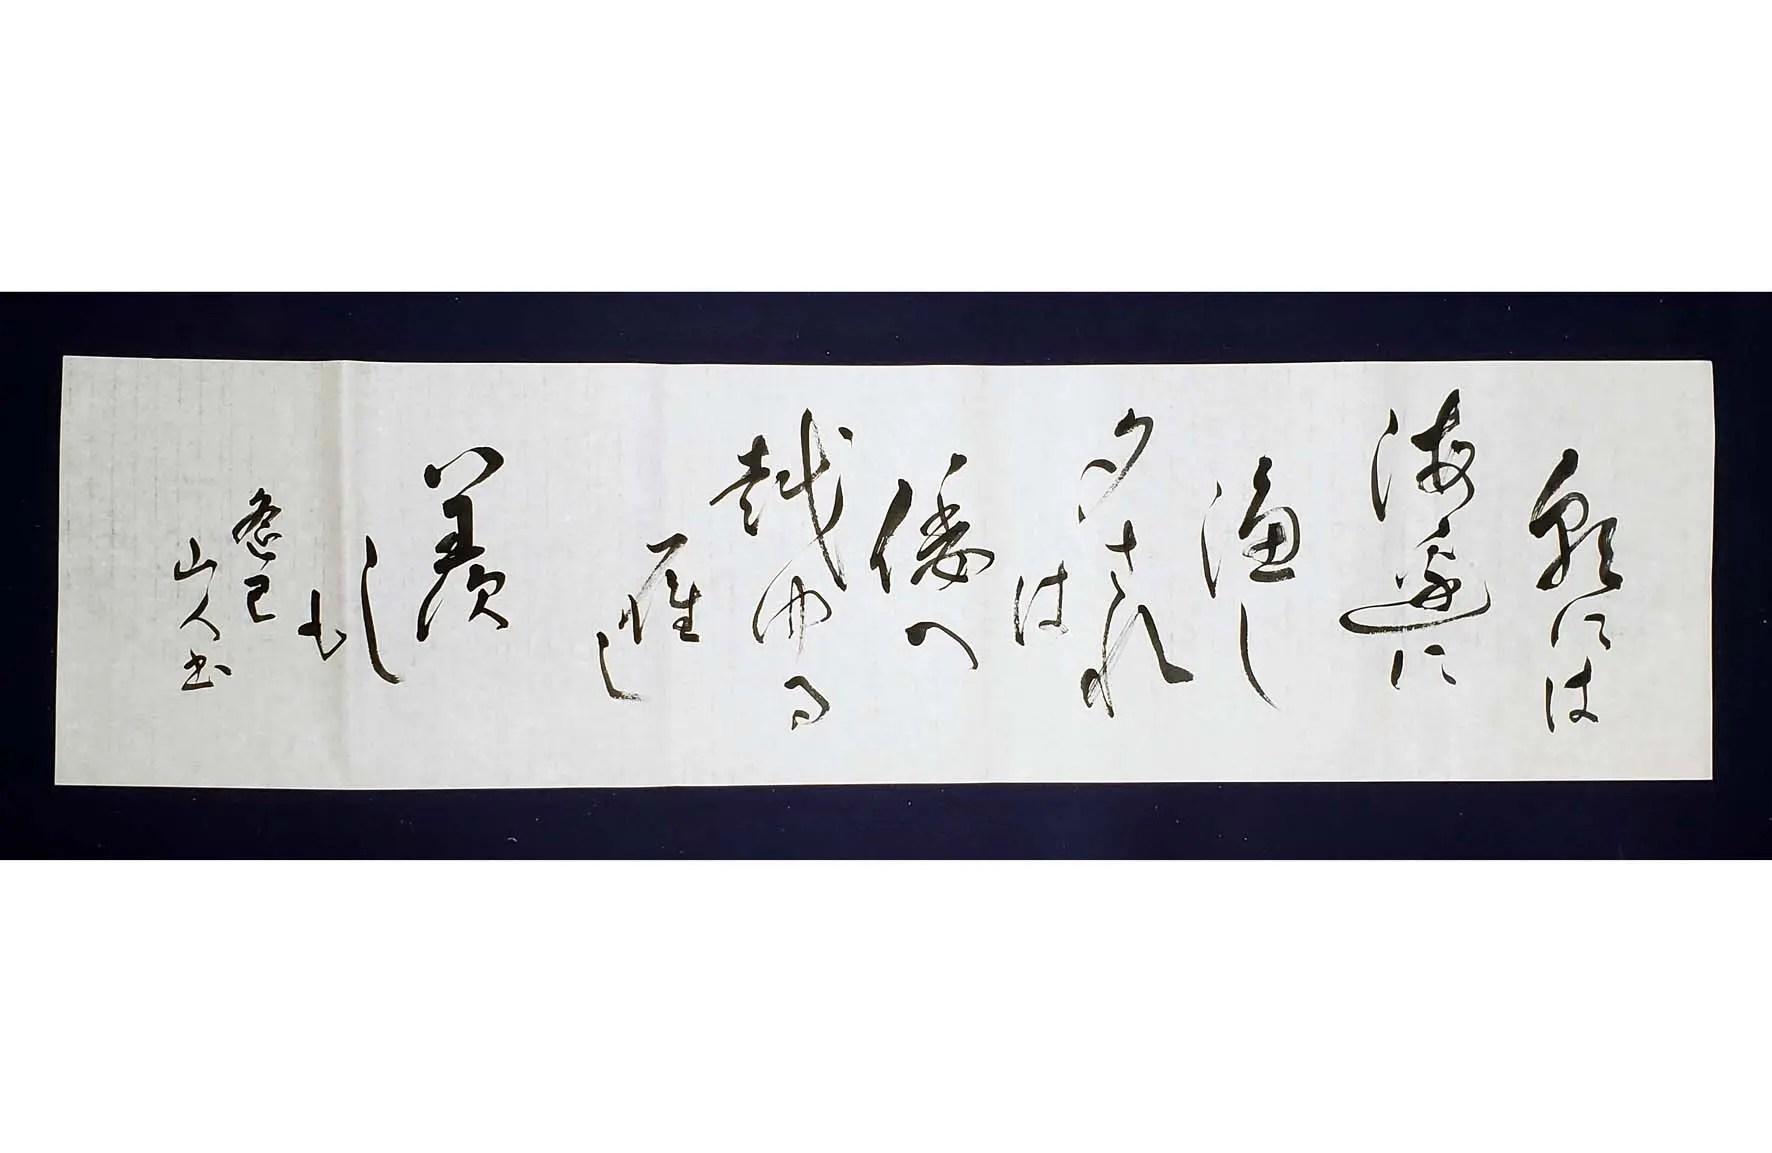 仮名の半切扁額(横書き)【半切作品】鎌倉市長谷の書道教室